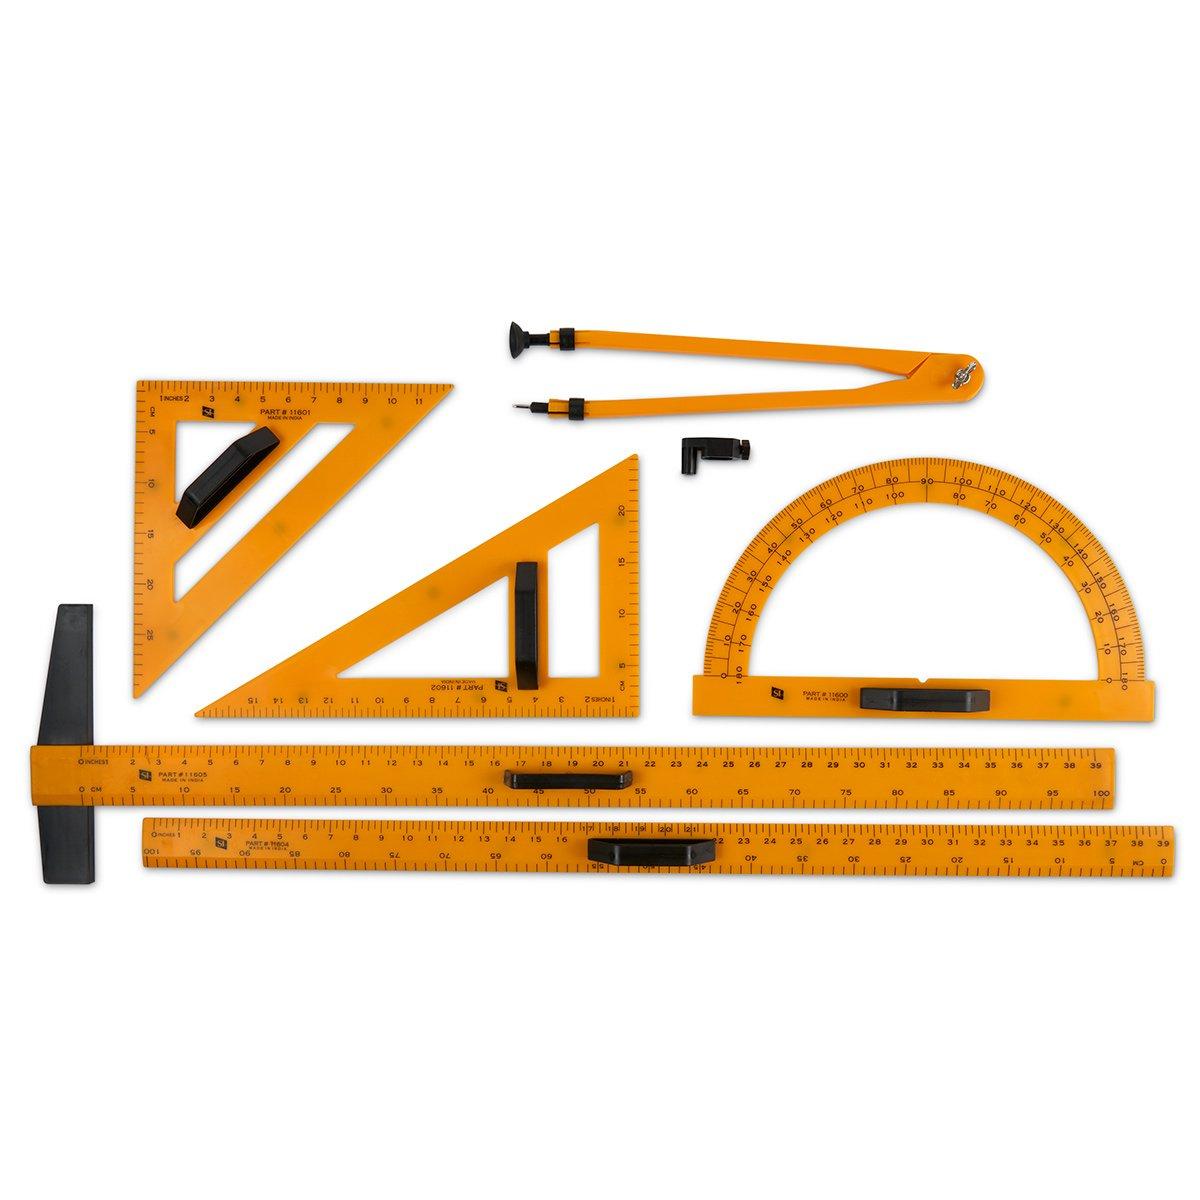 Generic Whiteboard/Chalkboard Drawing Tool Set